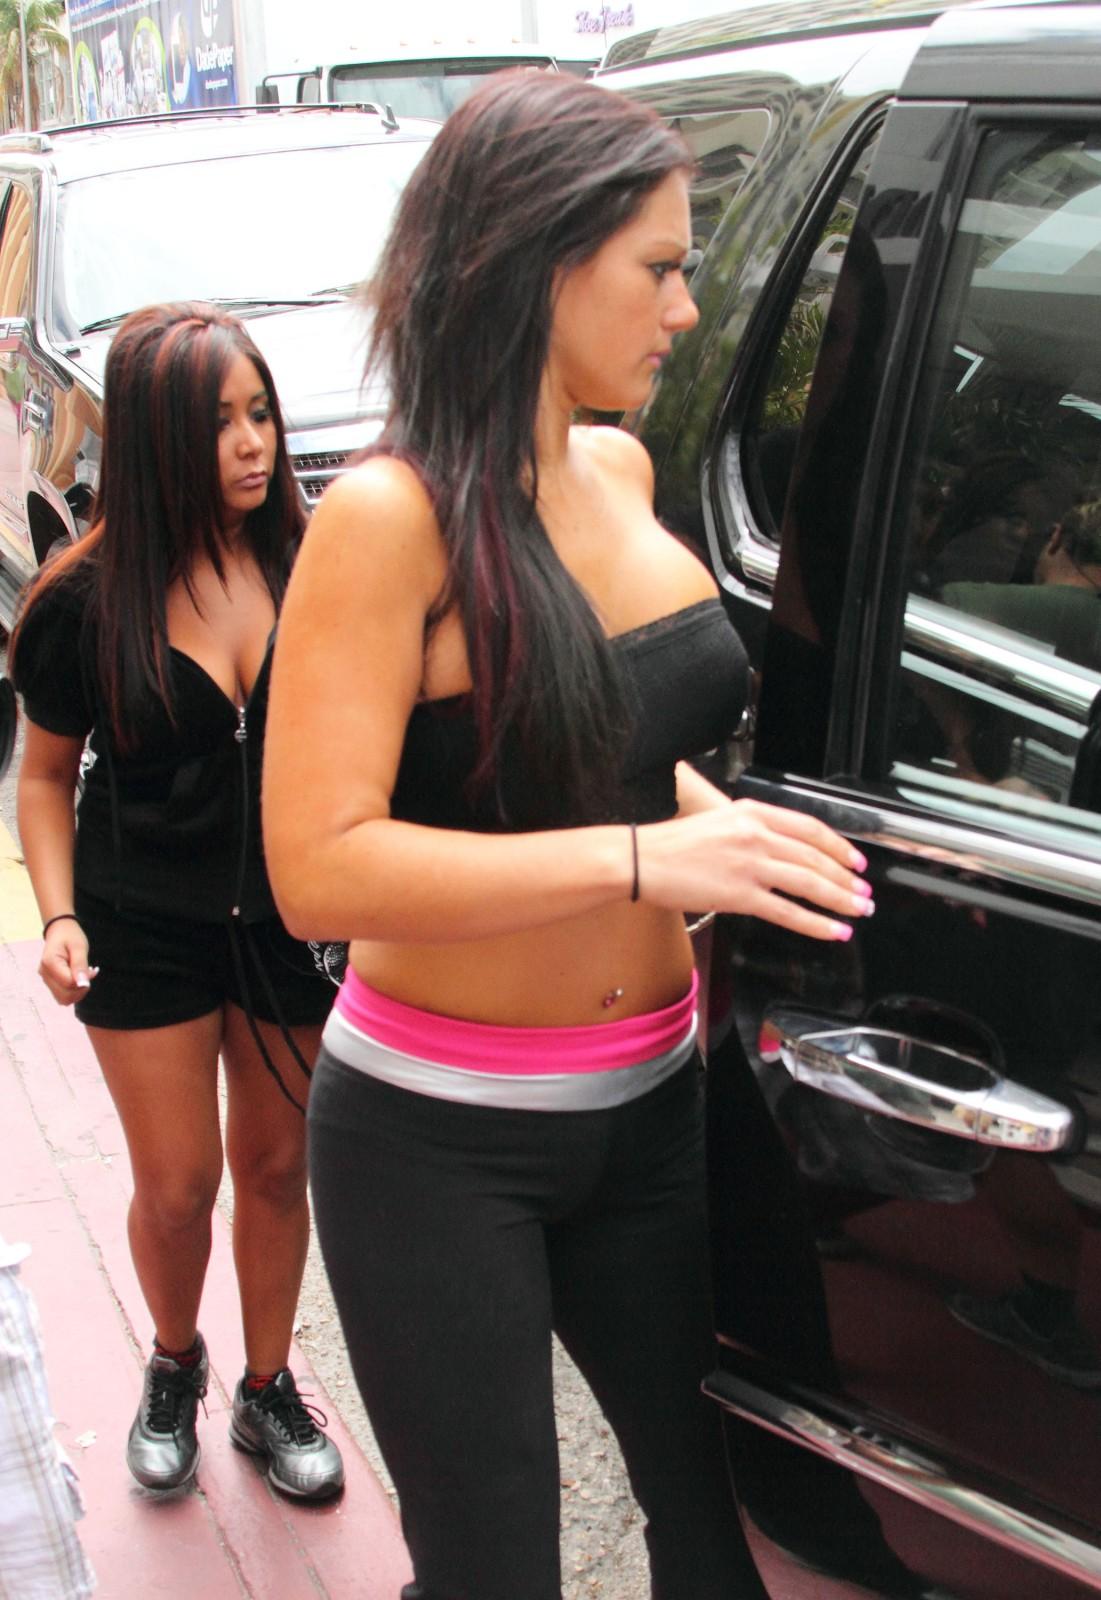 http://2.bp.blogspot.com/_AjWUpQhTvyg/S7xyHzrE4sI/AAAAAAAAAc4/gPv4_eQEspU/s1600/Jenni+Farley+Her+Body+Show7.jpg